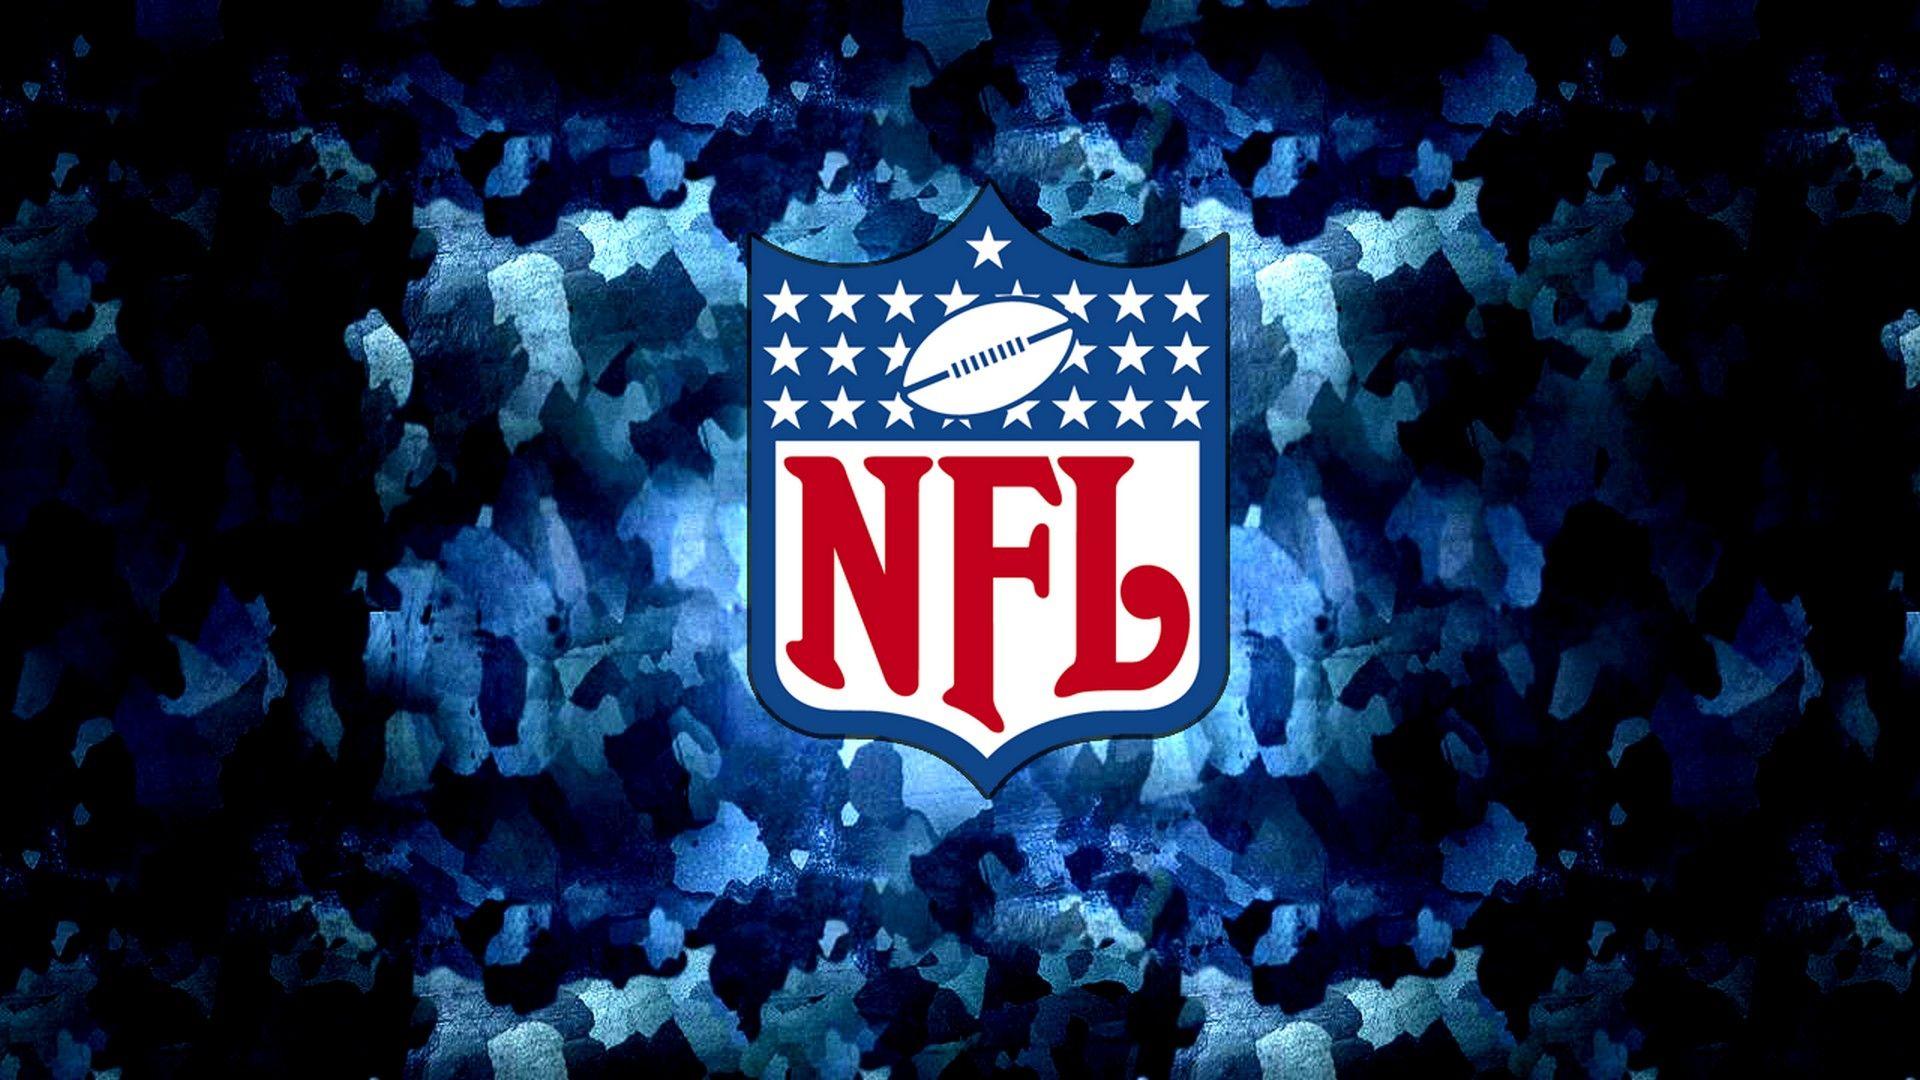 Cool Nfl Desktop Wallpaper 2020 Nfl Football Wallpapers Nfl Football Wallpaper Nfl Nfl Playoffs